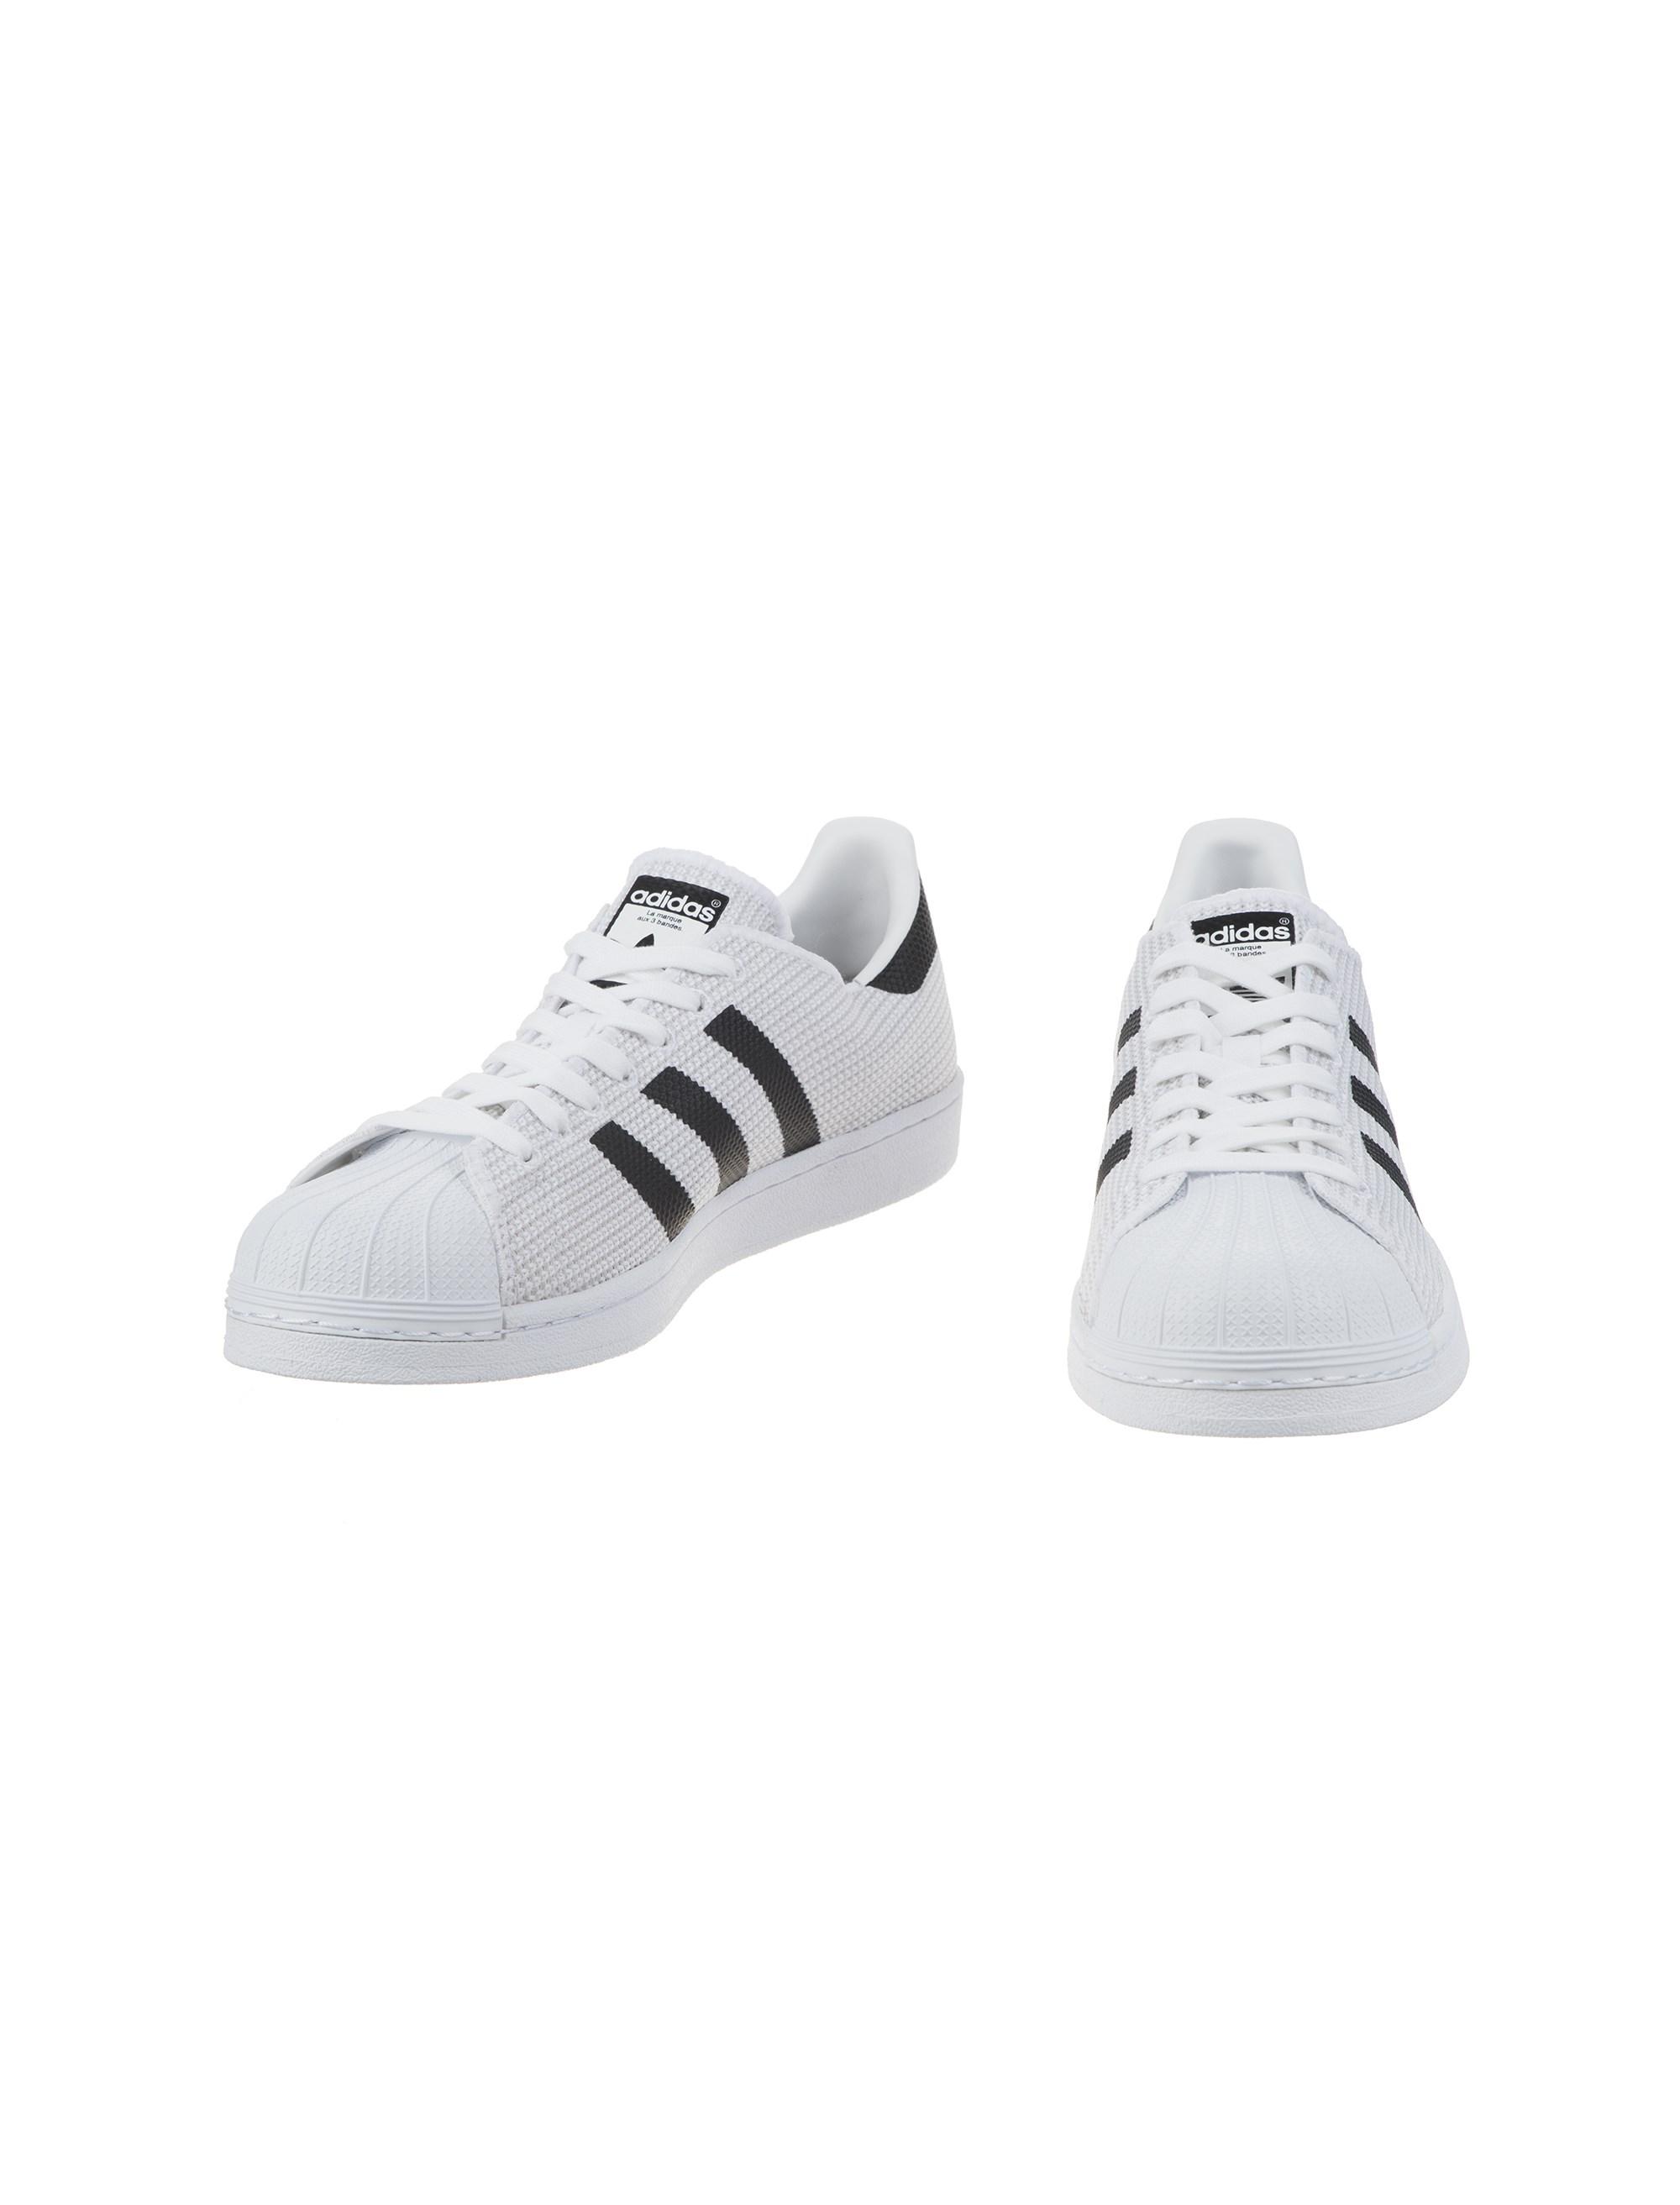 کفش راحتی آدیداس مدل Superstar